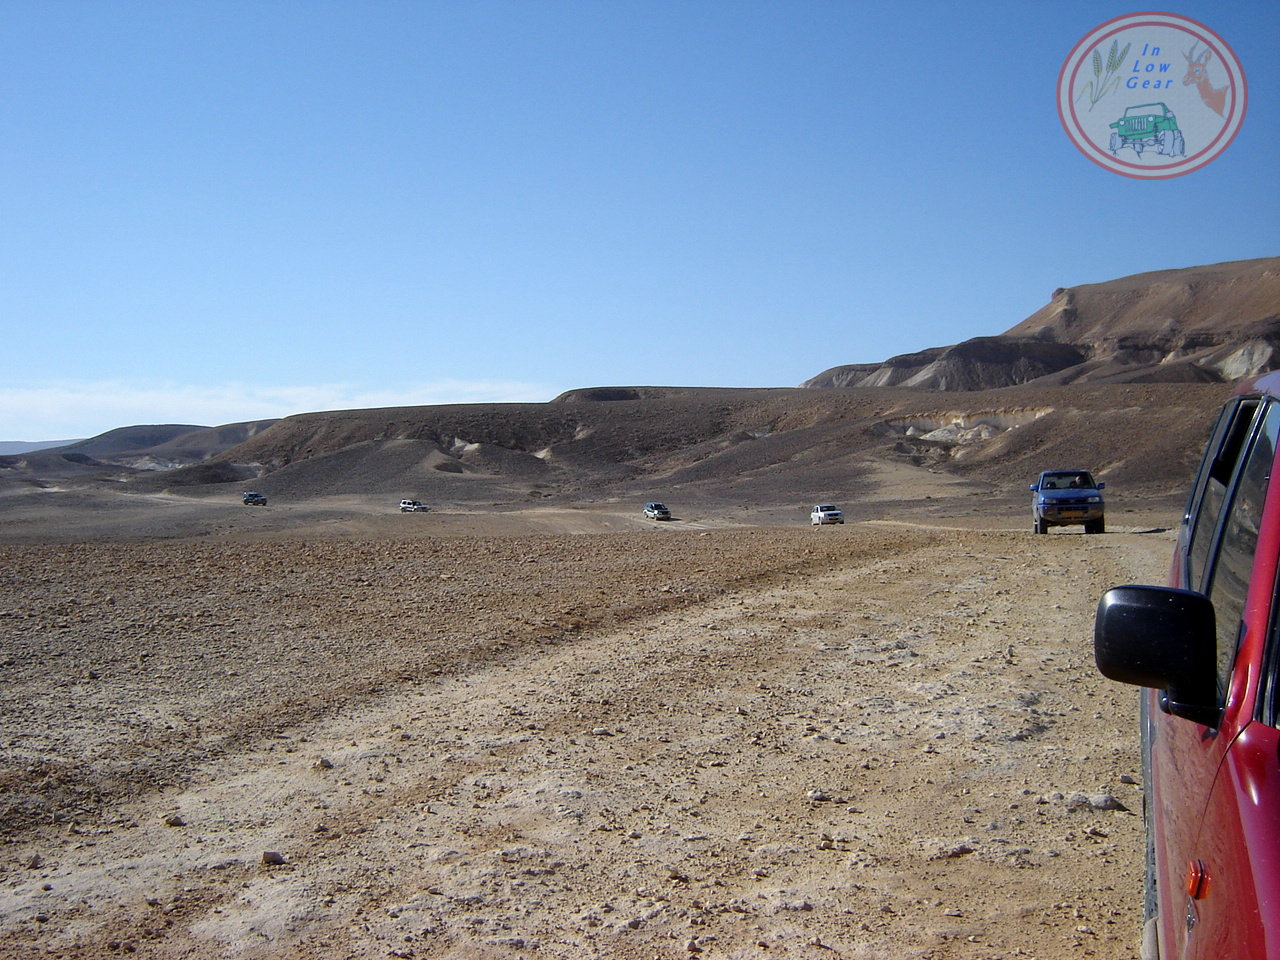 Nahal Nekarot Elyon jeep tours